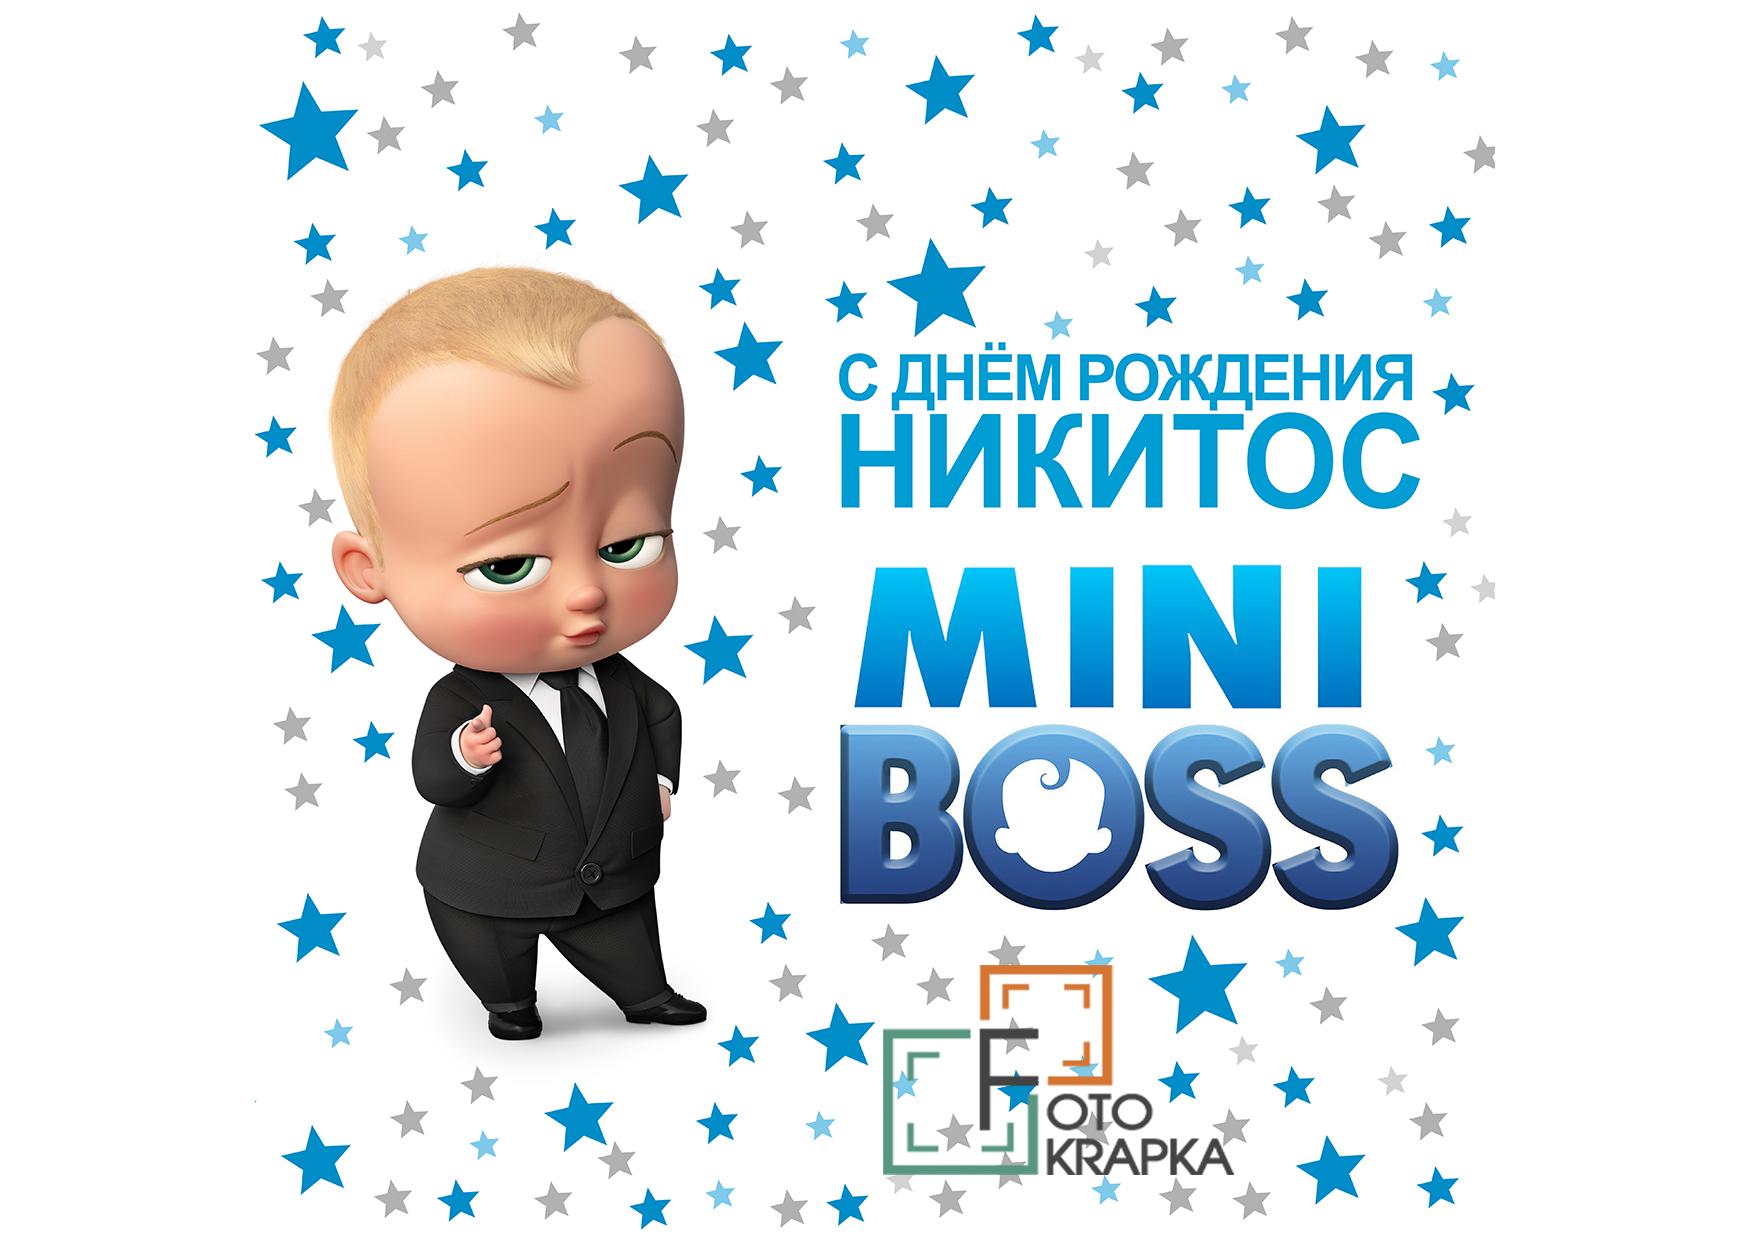 Фотозона босс Молокосос Херсон